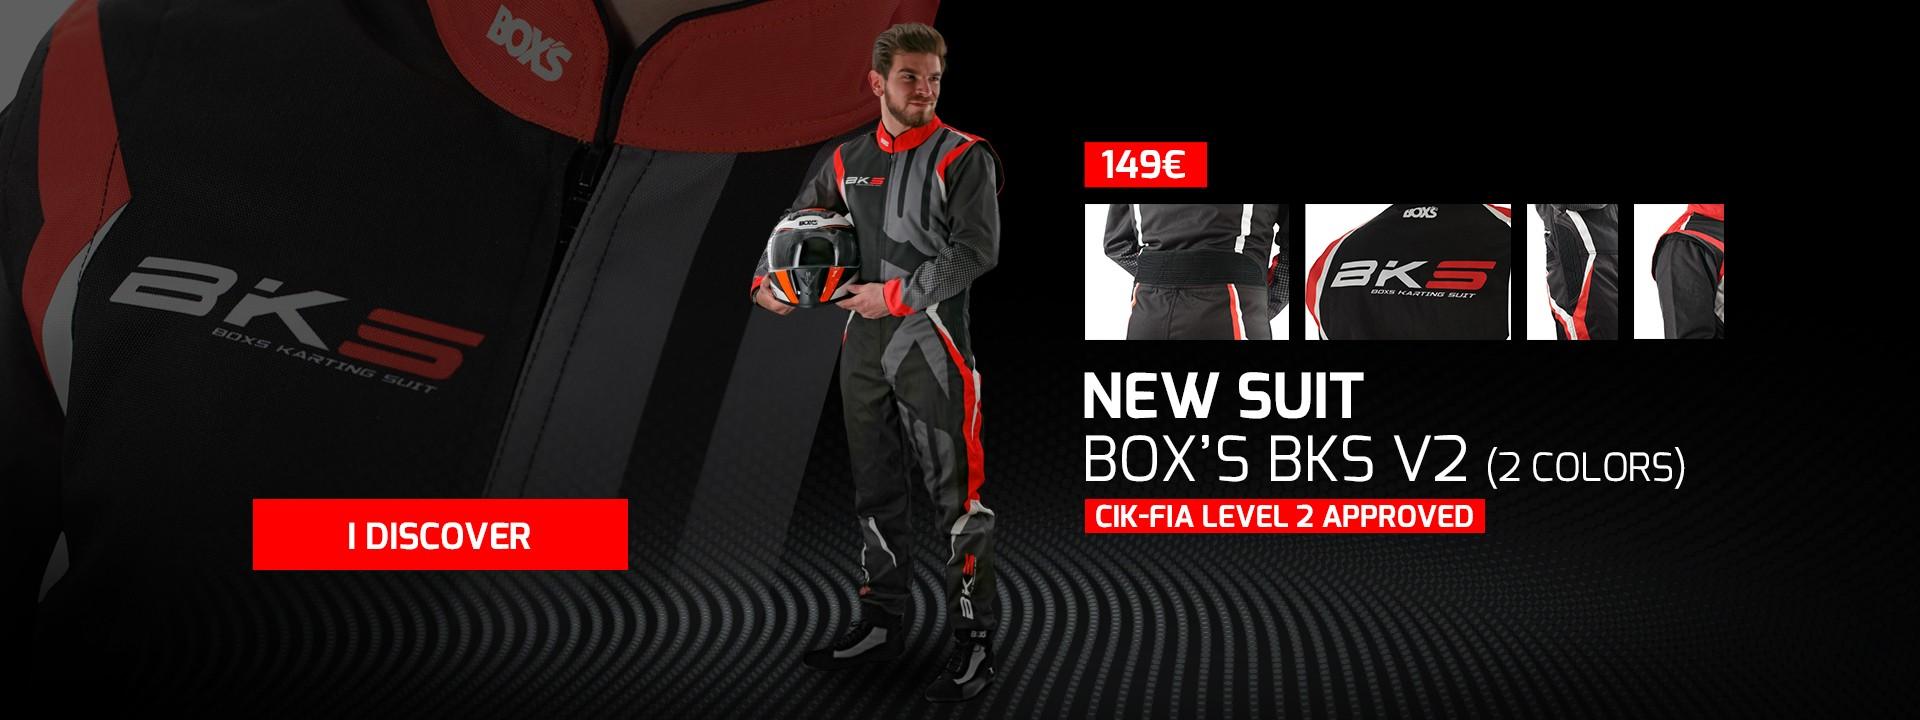 New BOX'S BKS V2 suit